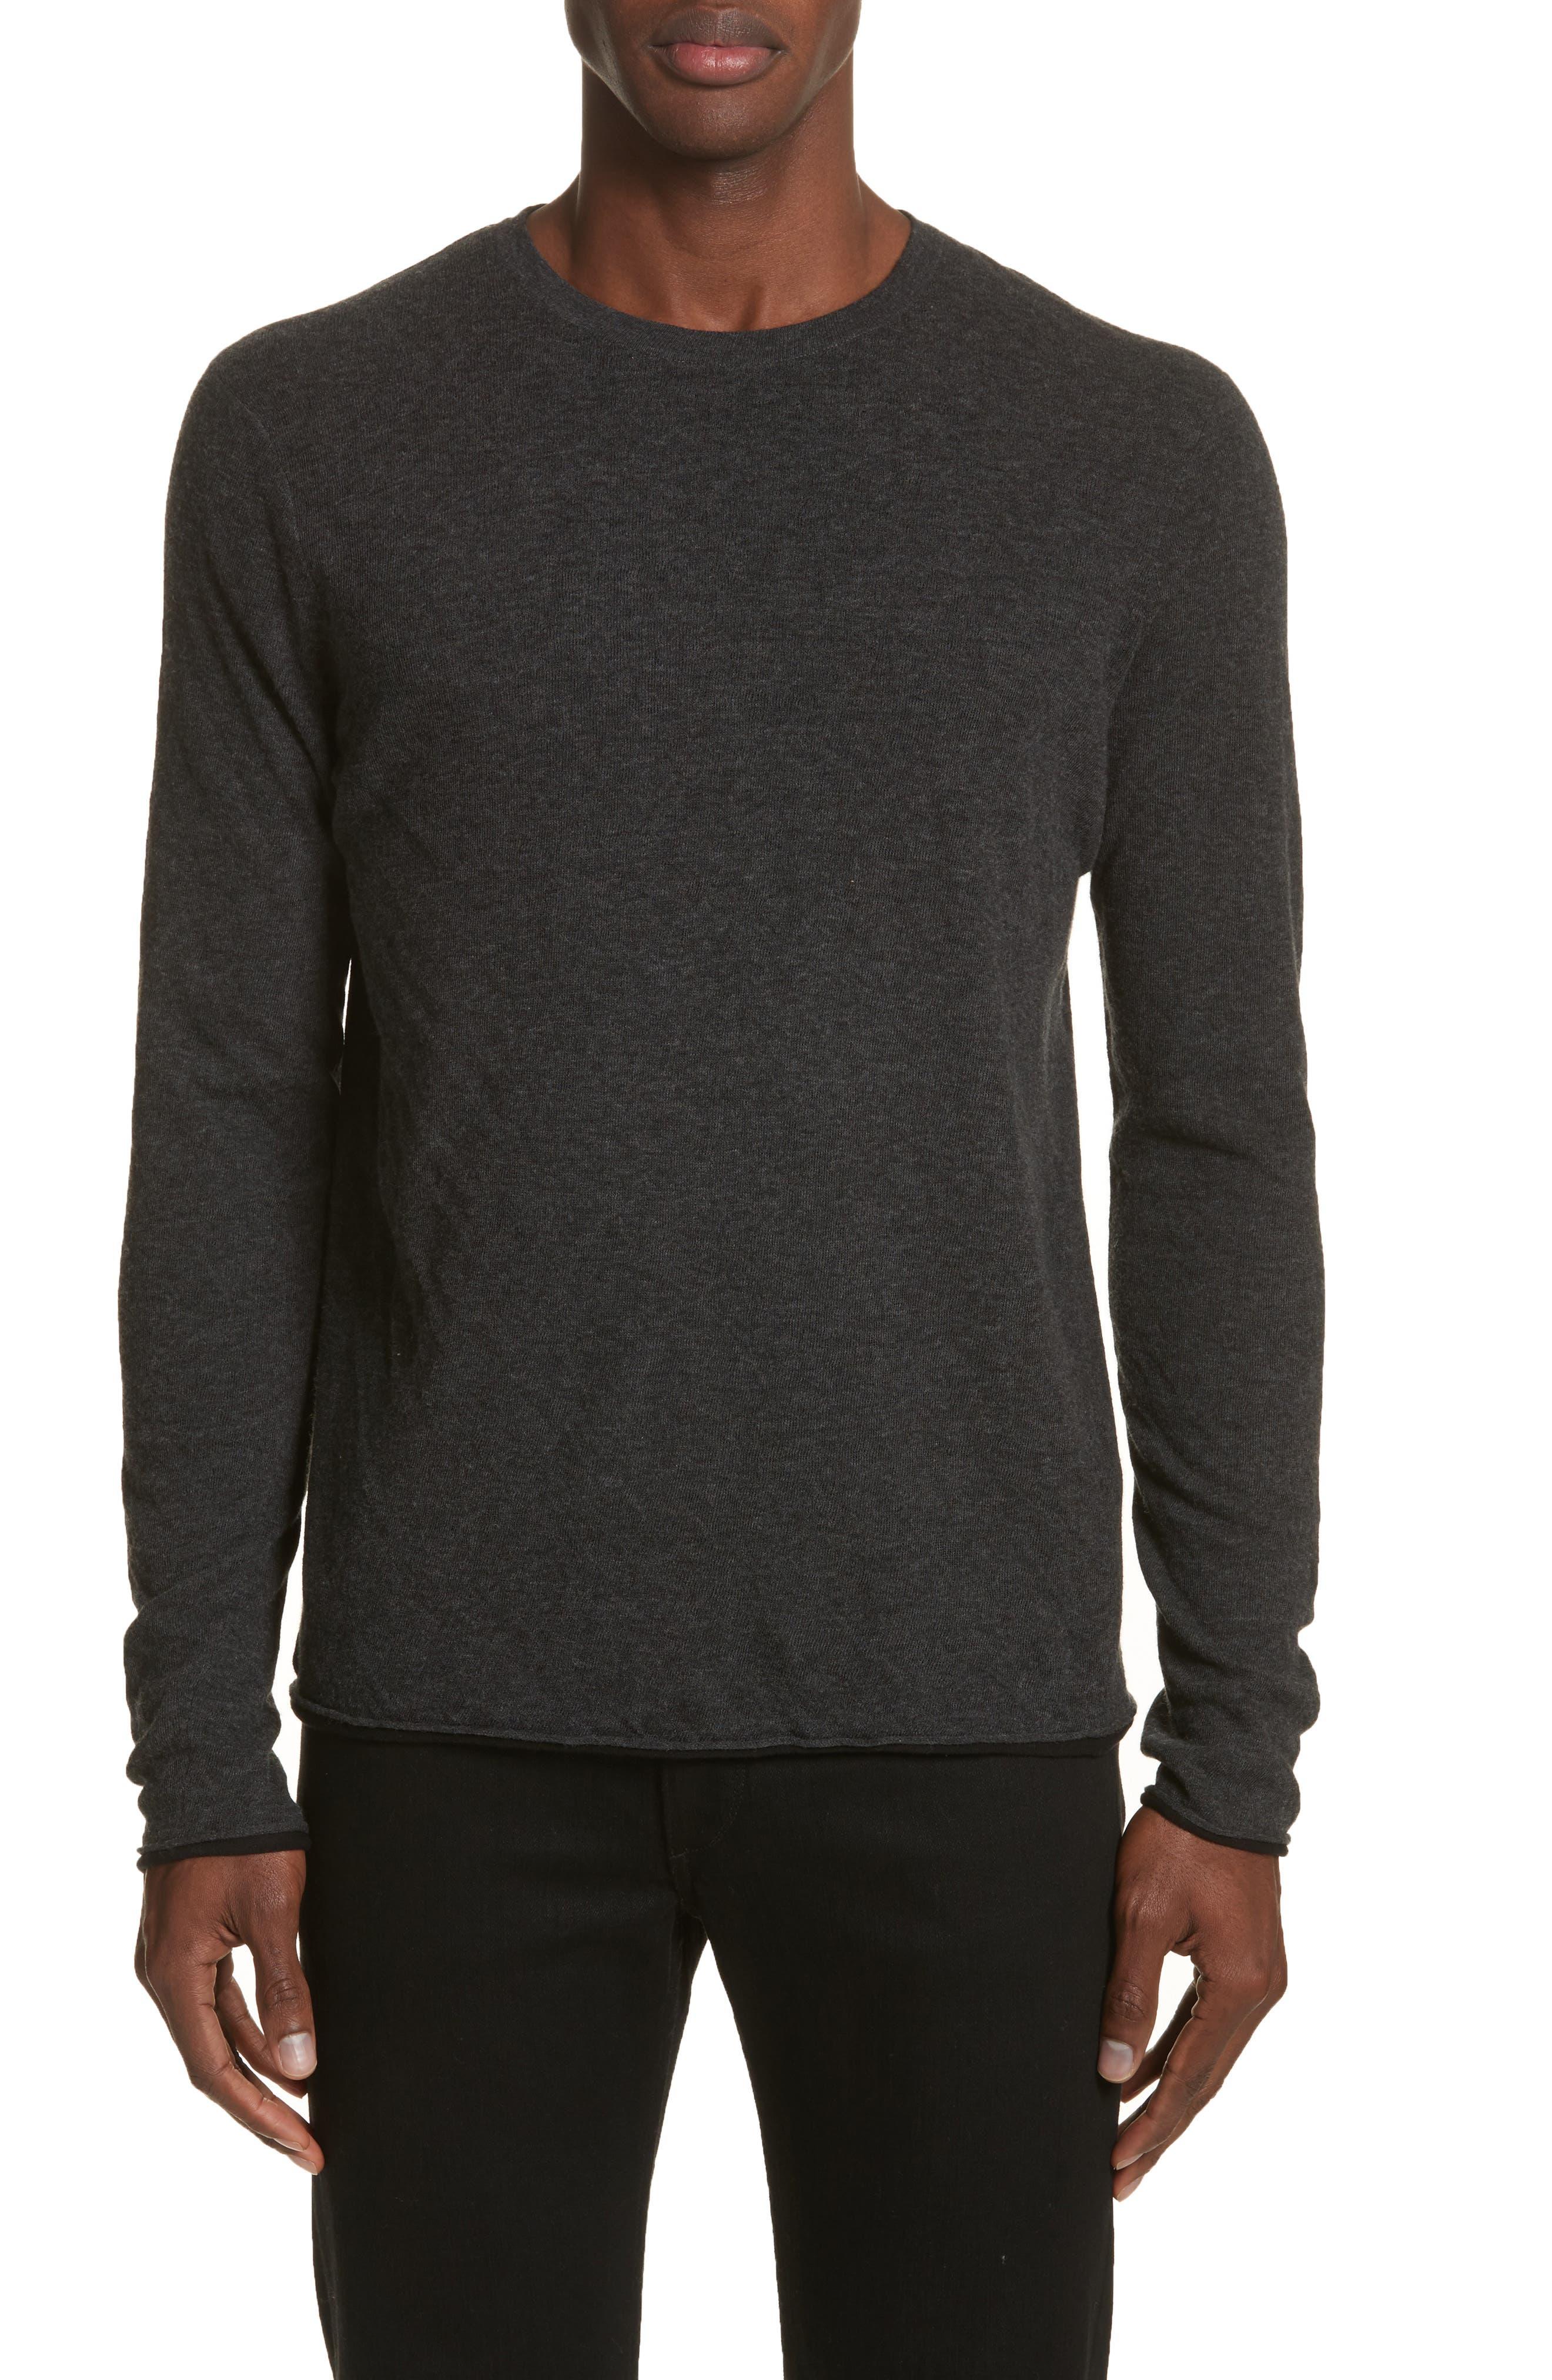 Alternate Image 1 Selected - rag & bone Tripp Sweater